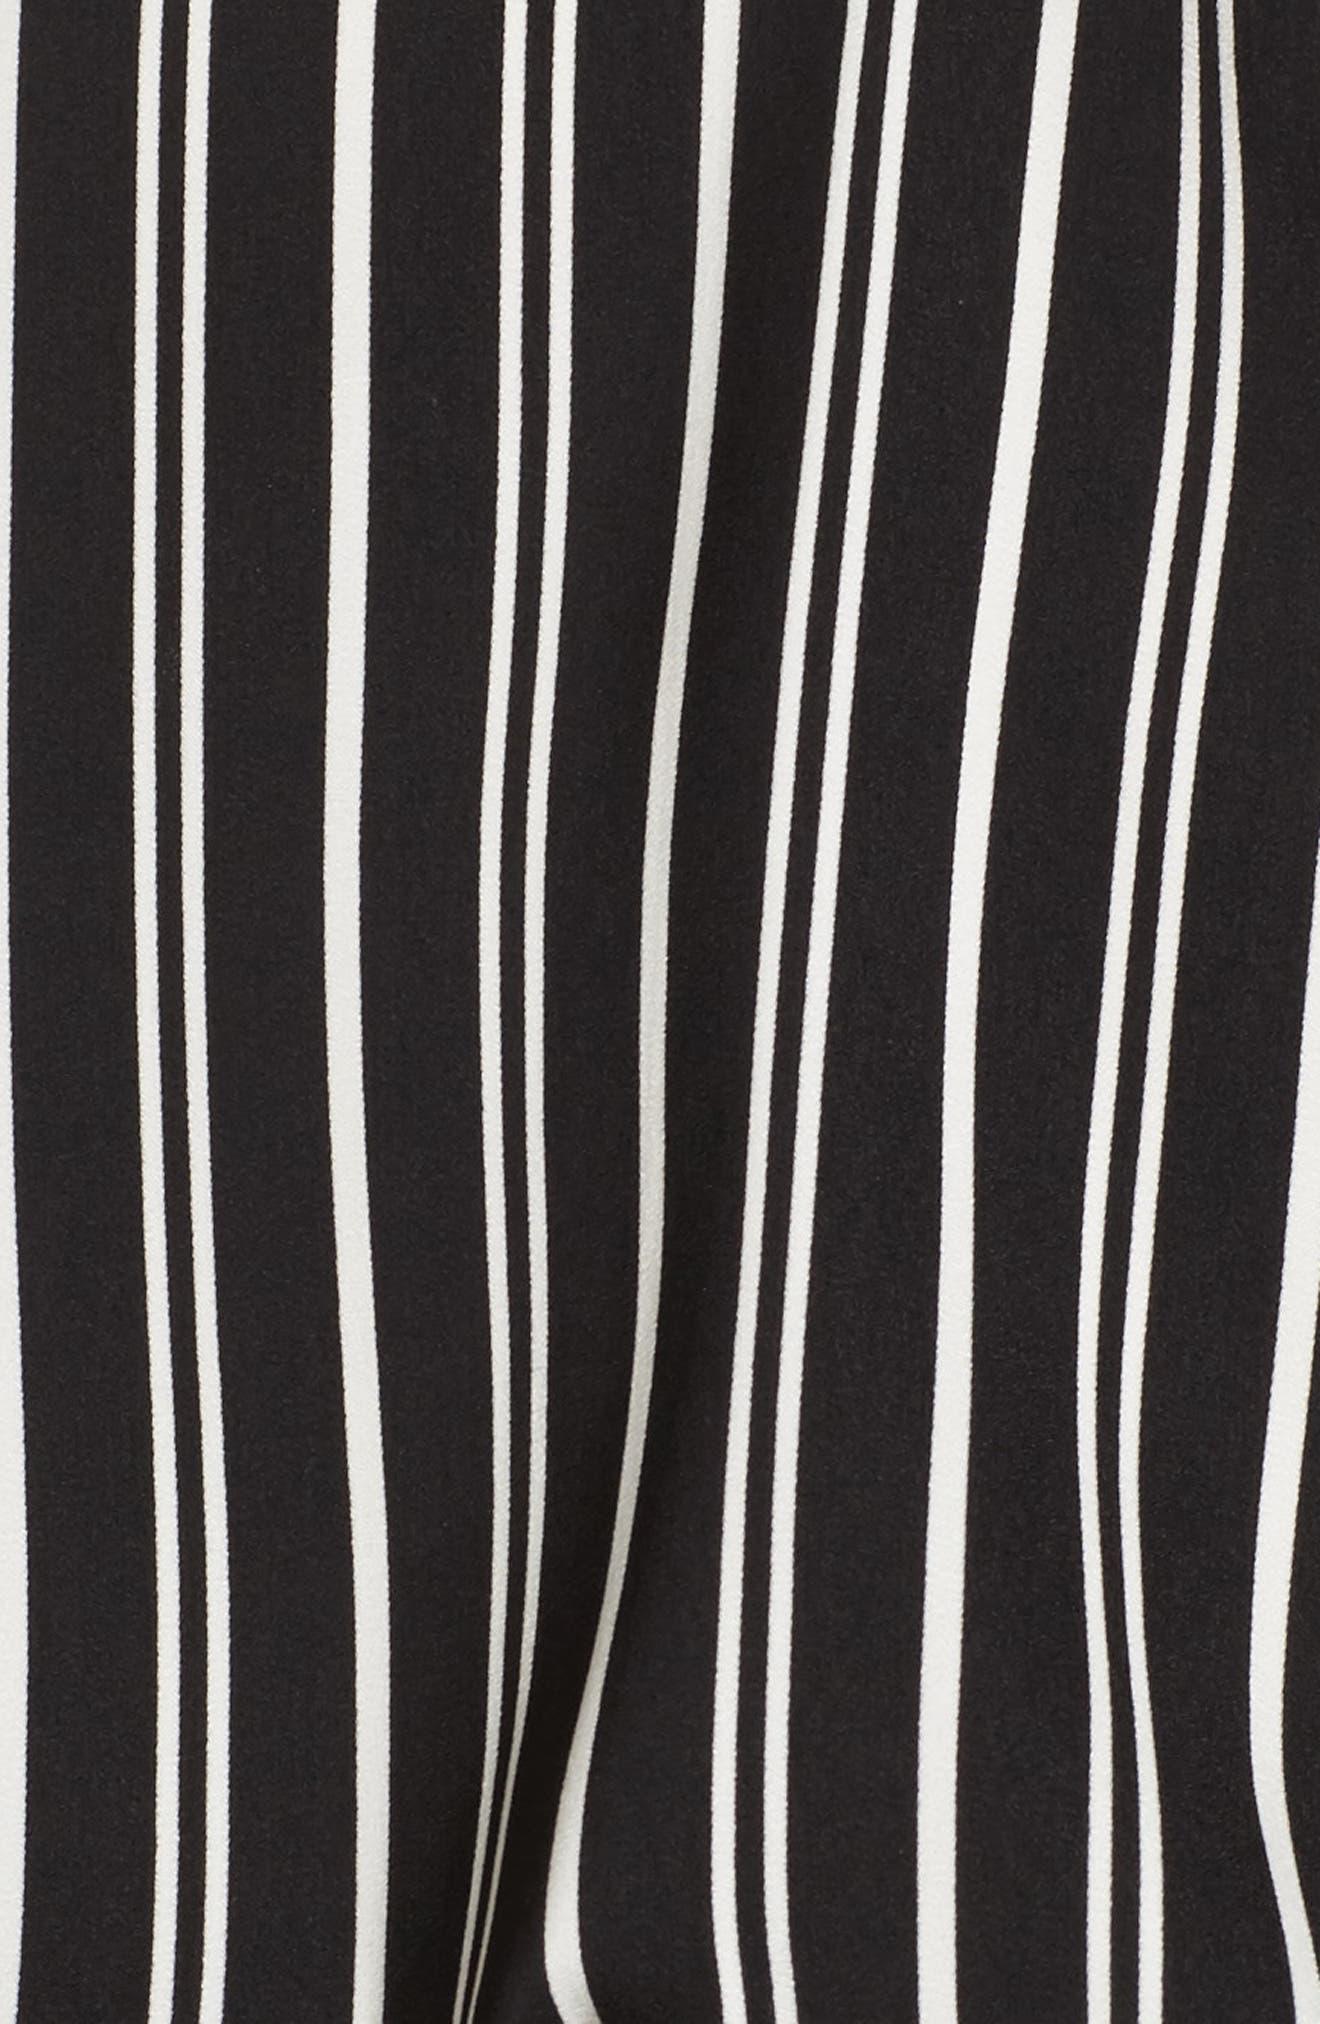 Ophelia Stripe Flare Cuff Top,                             Alternate thumbnail 5, color,